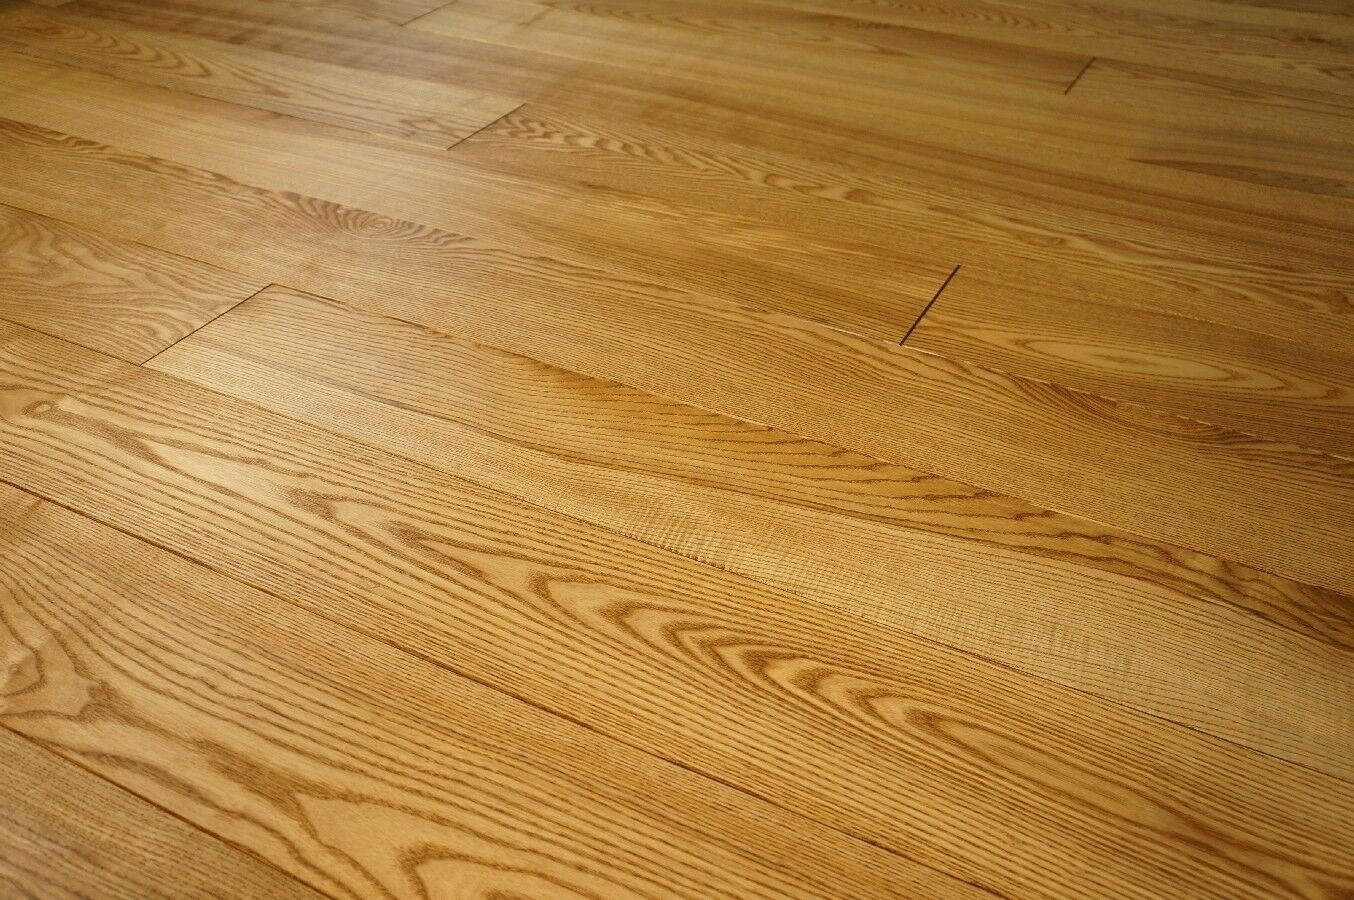 Massivholzdiele Esche Select-Natur 15x160 x 600-2800mm geölt in Farbton Nußbaum